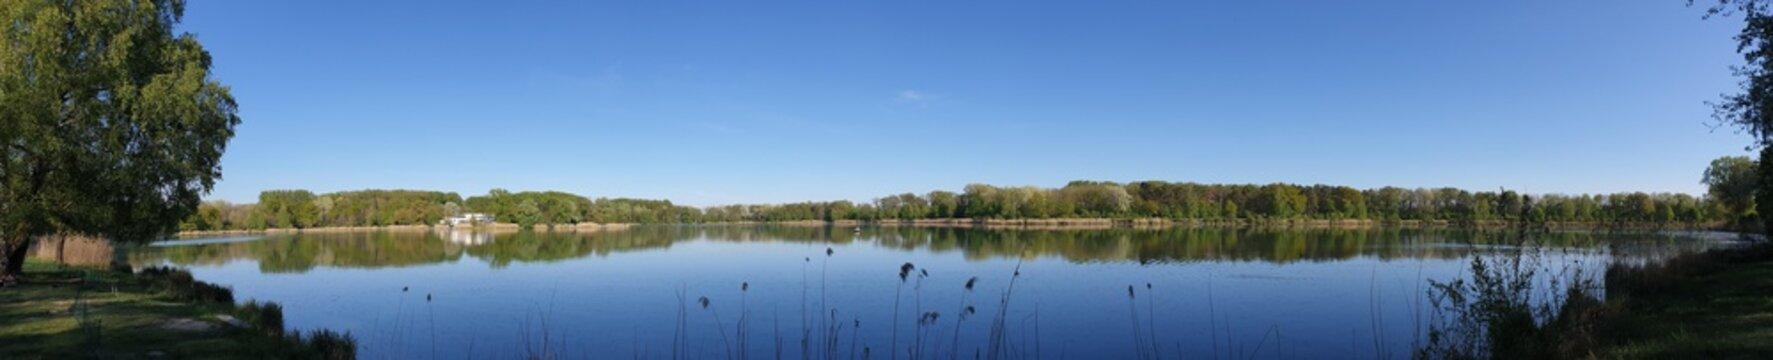 Naherholungsgebiet Baggersee in Ingolstadt